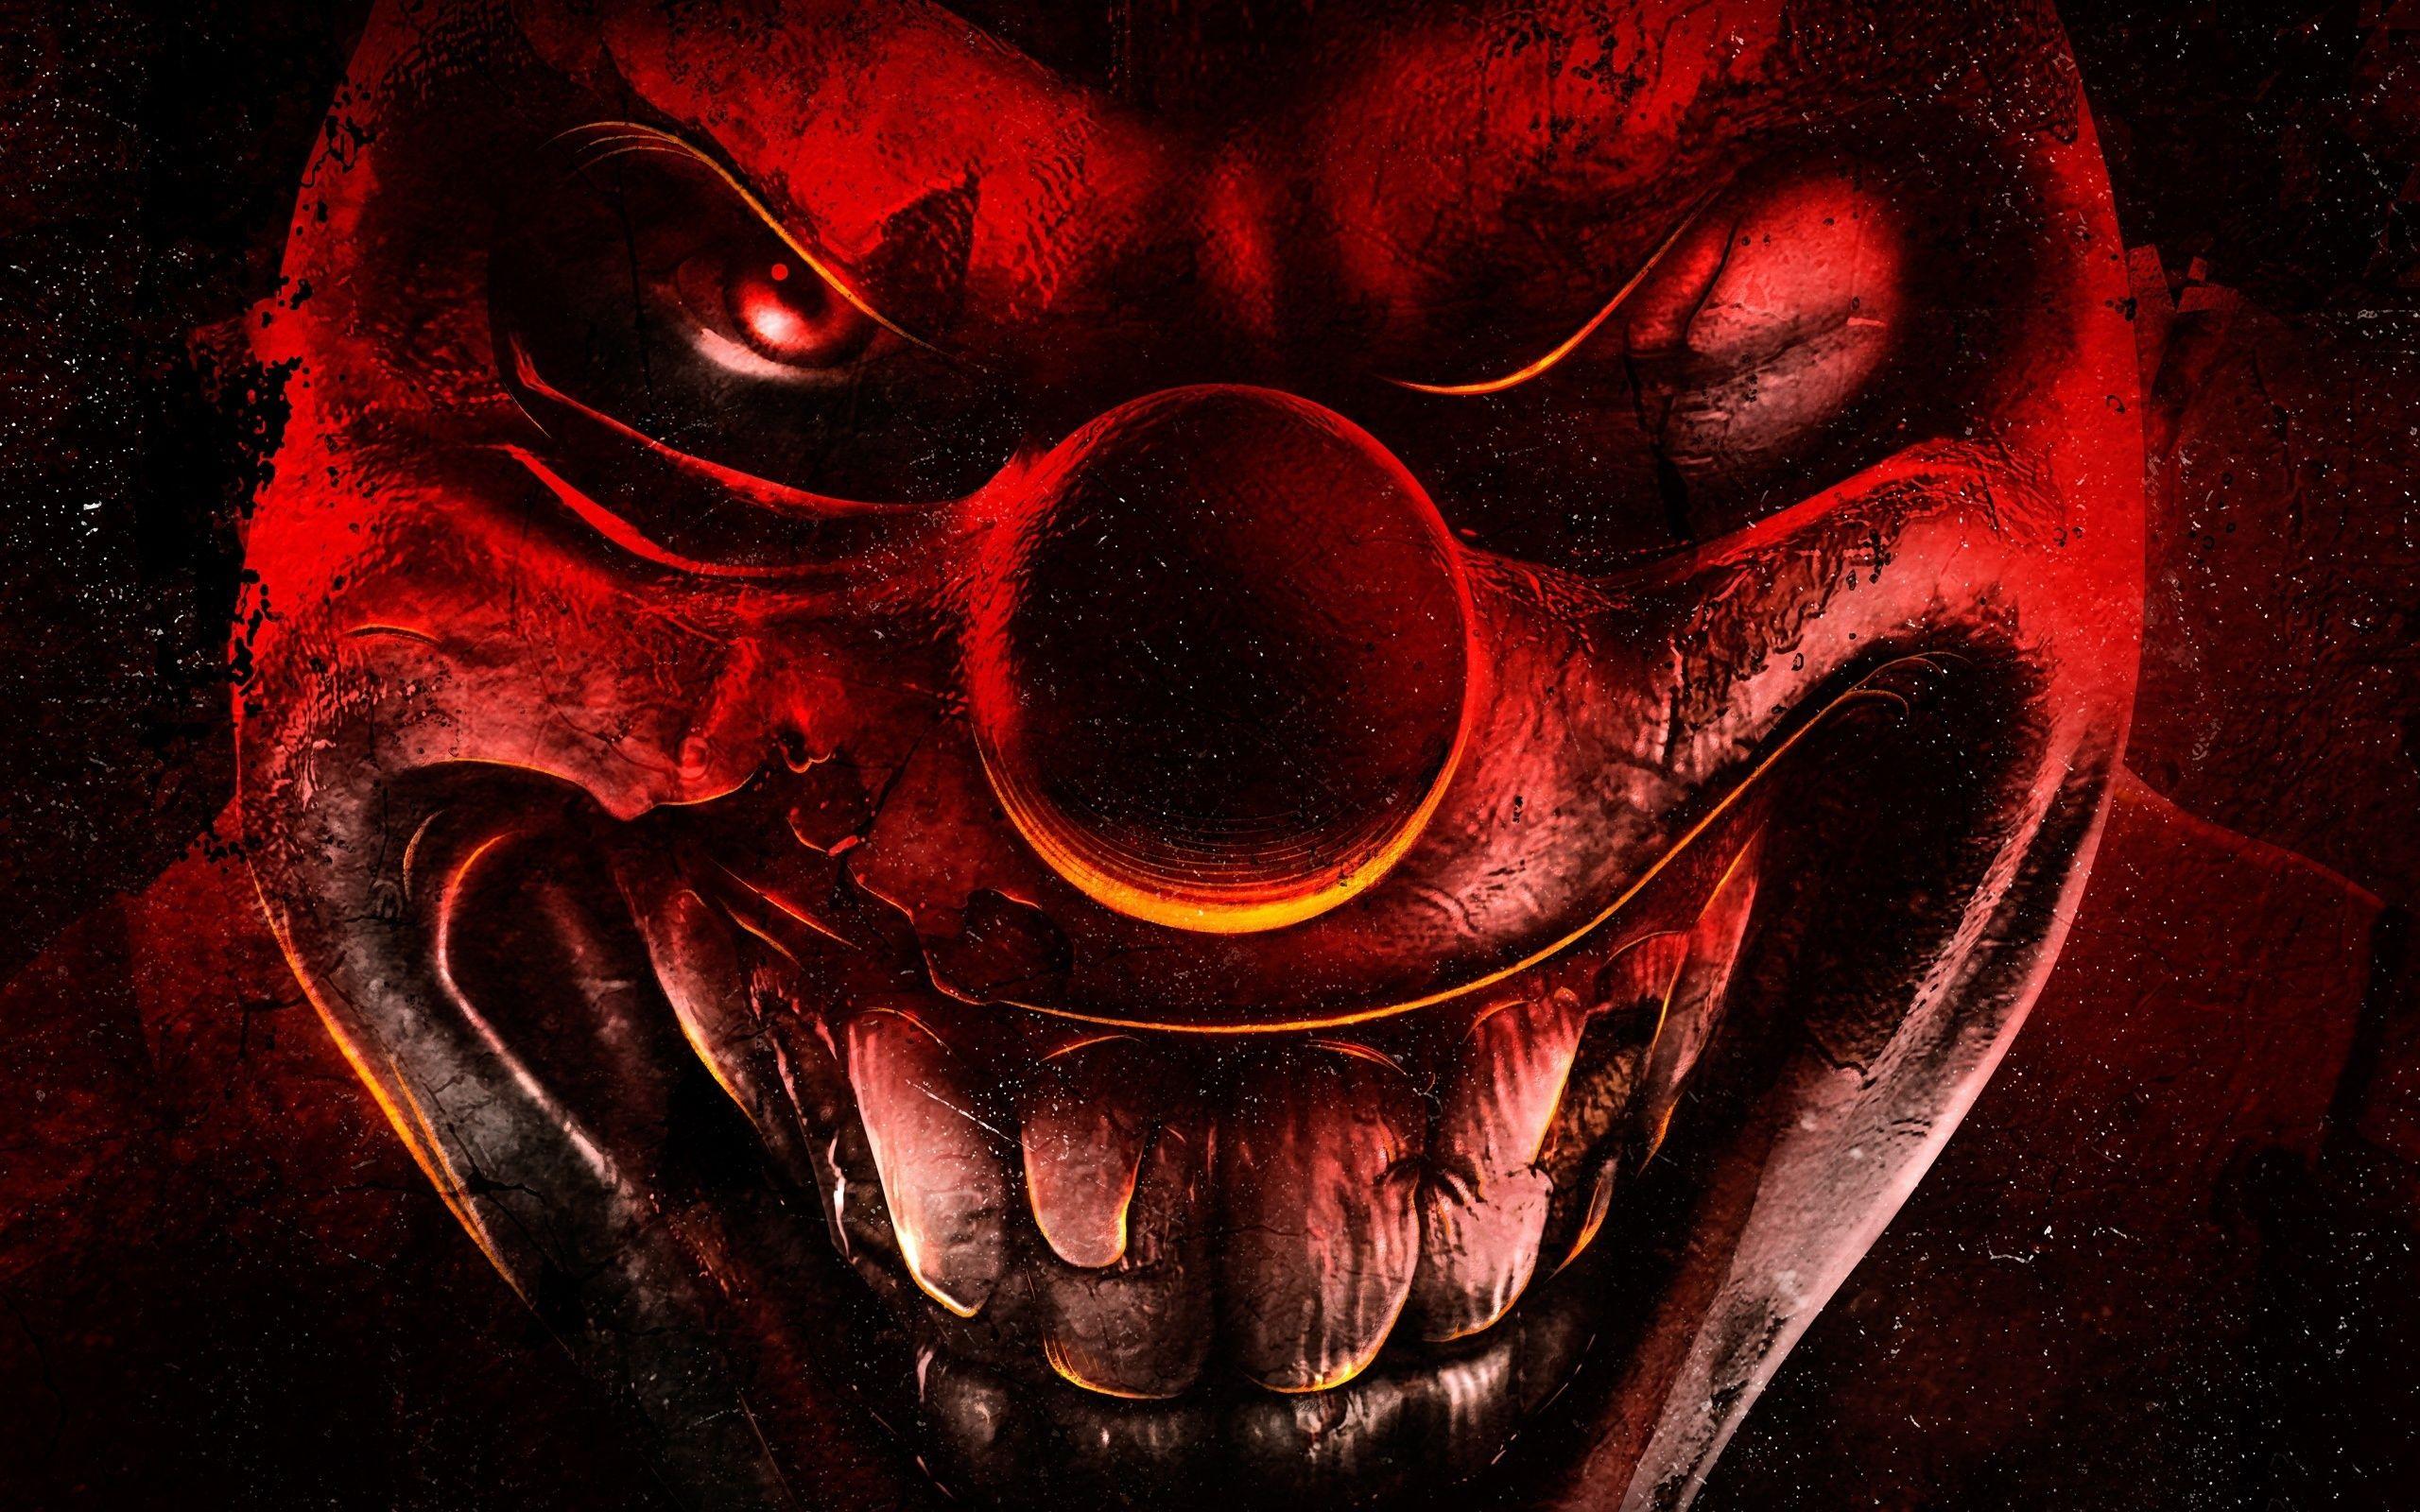 evil clown | nightmare the evil clown - full hd wallpapers 1080p